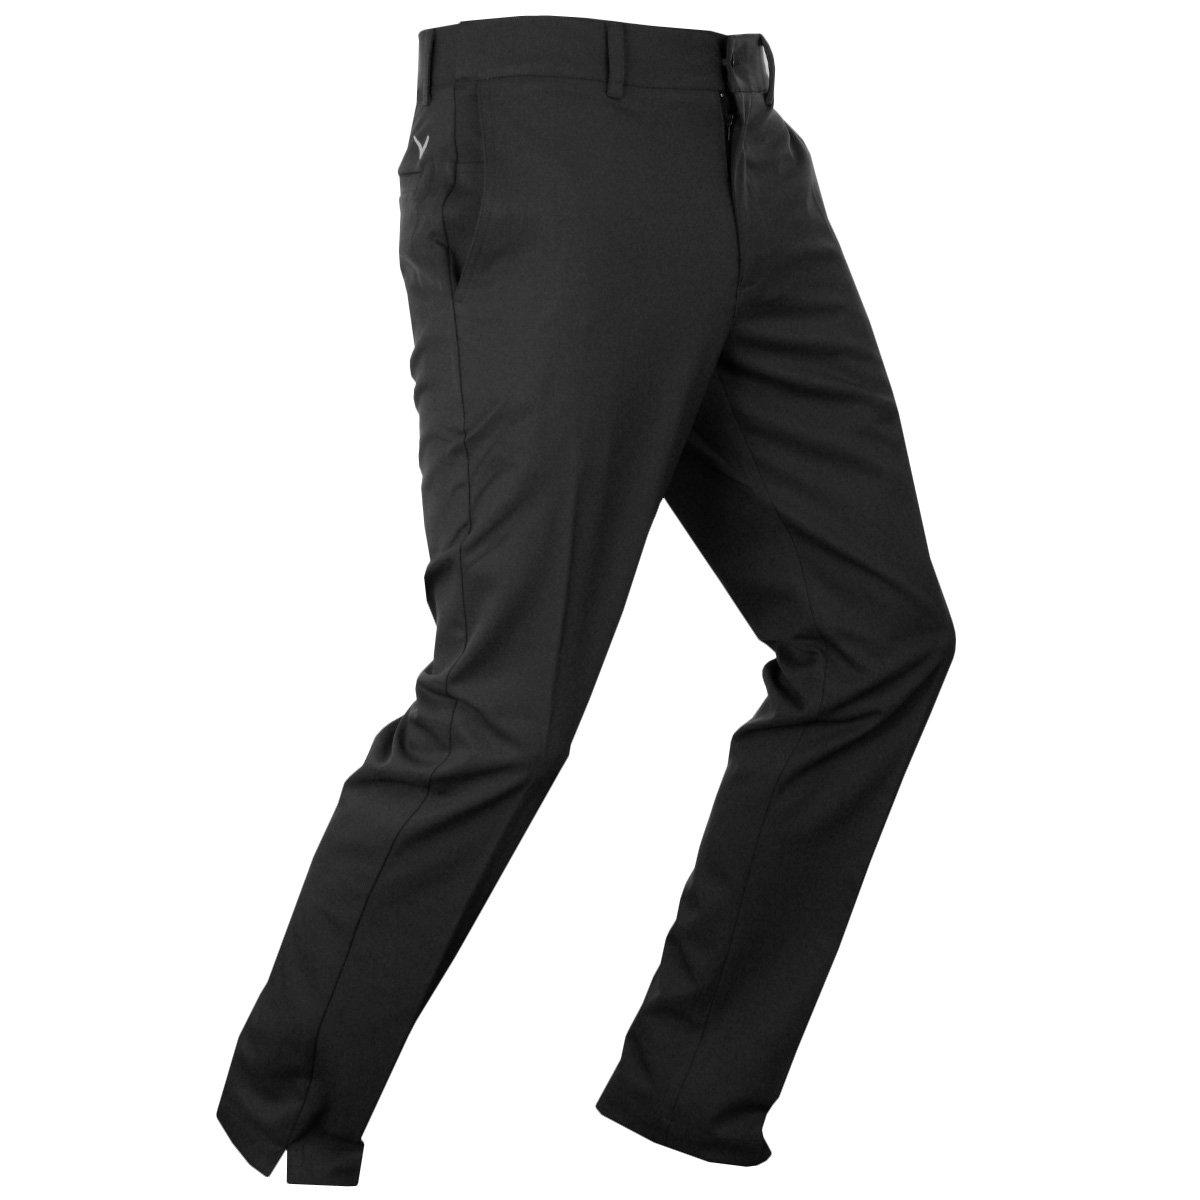 Callaway Golf Men's X Tech Trousers II Slim Fit Pant - US 36-32 - Caviar